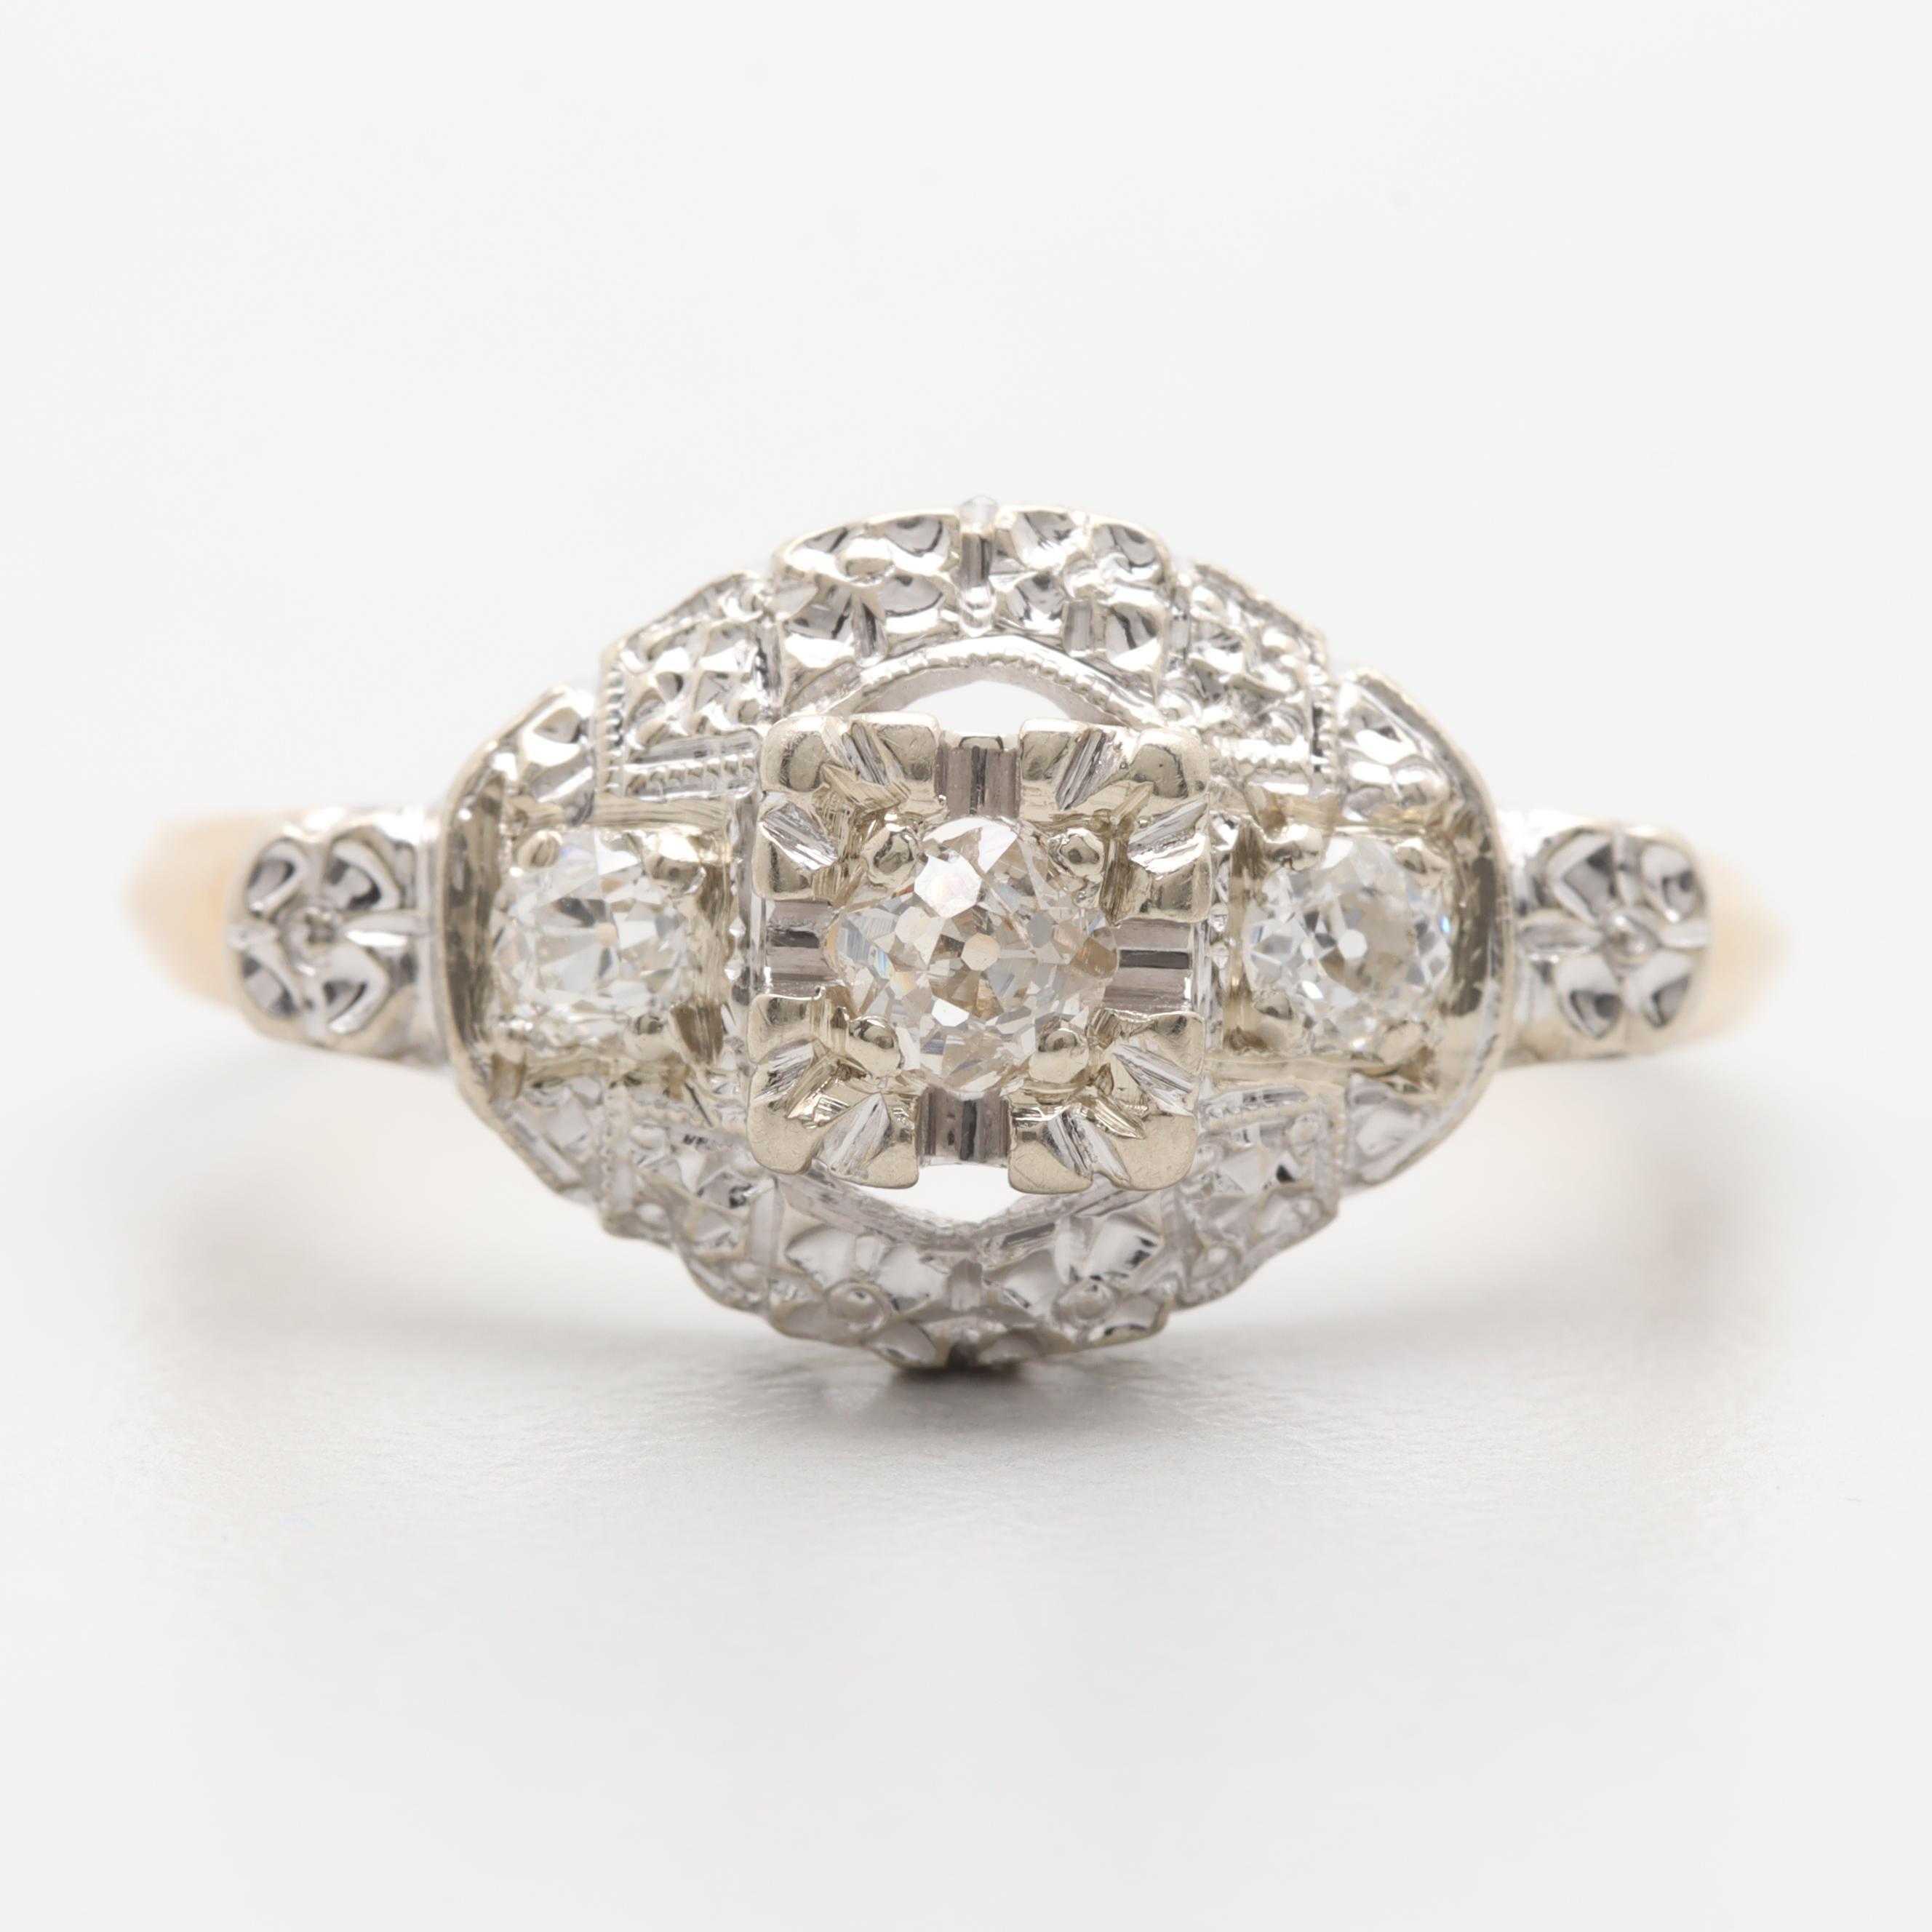 Circa 1920s - 1930s 14K Yellow and White Gold Diamond Ring